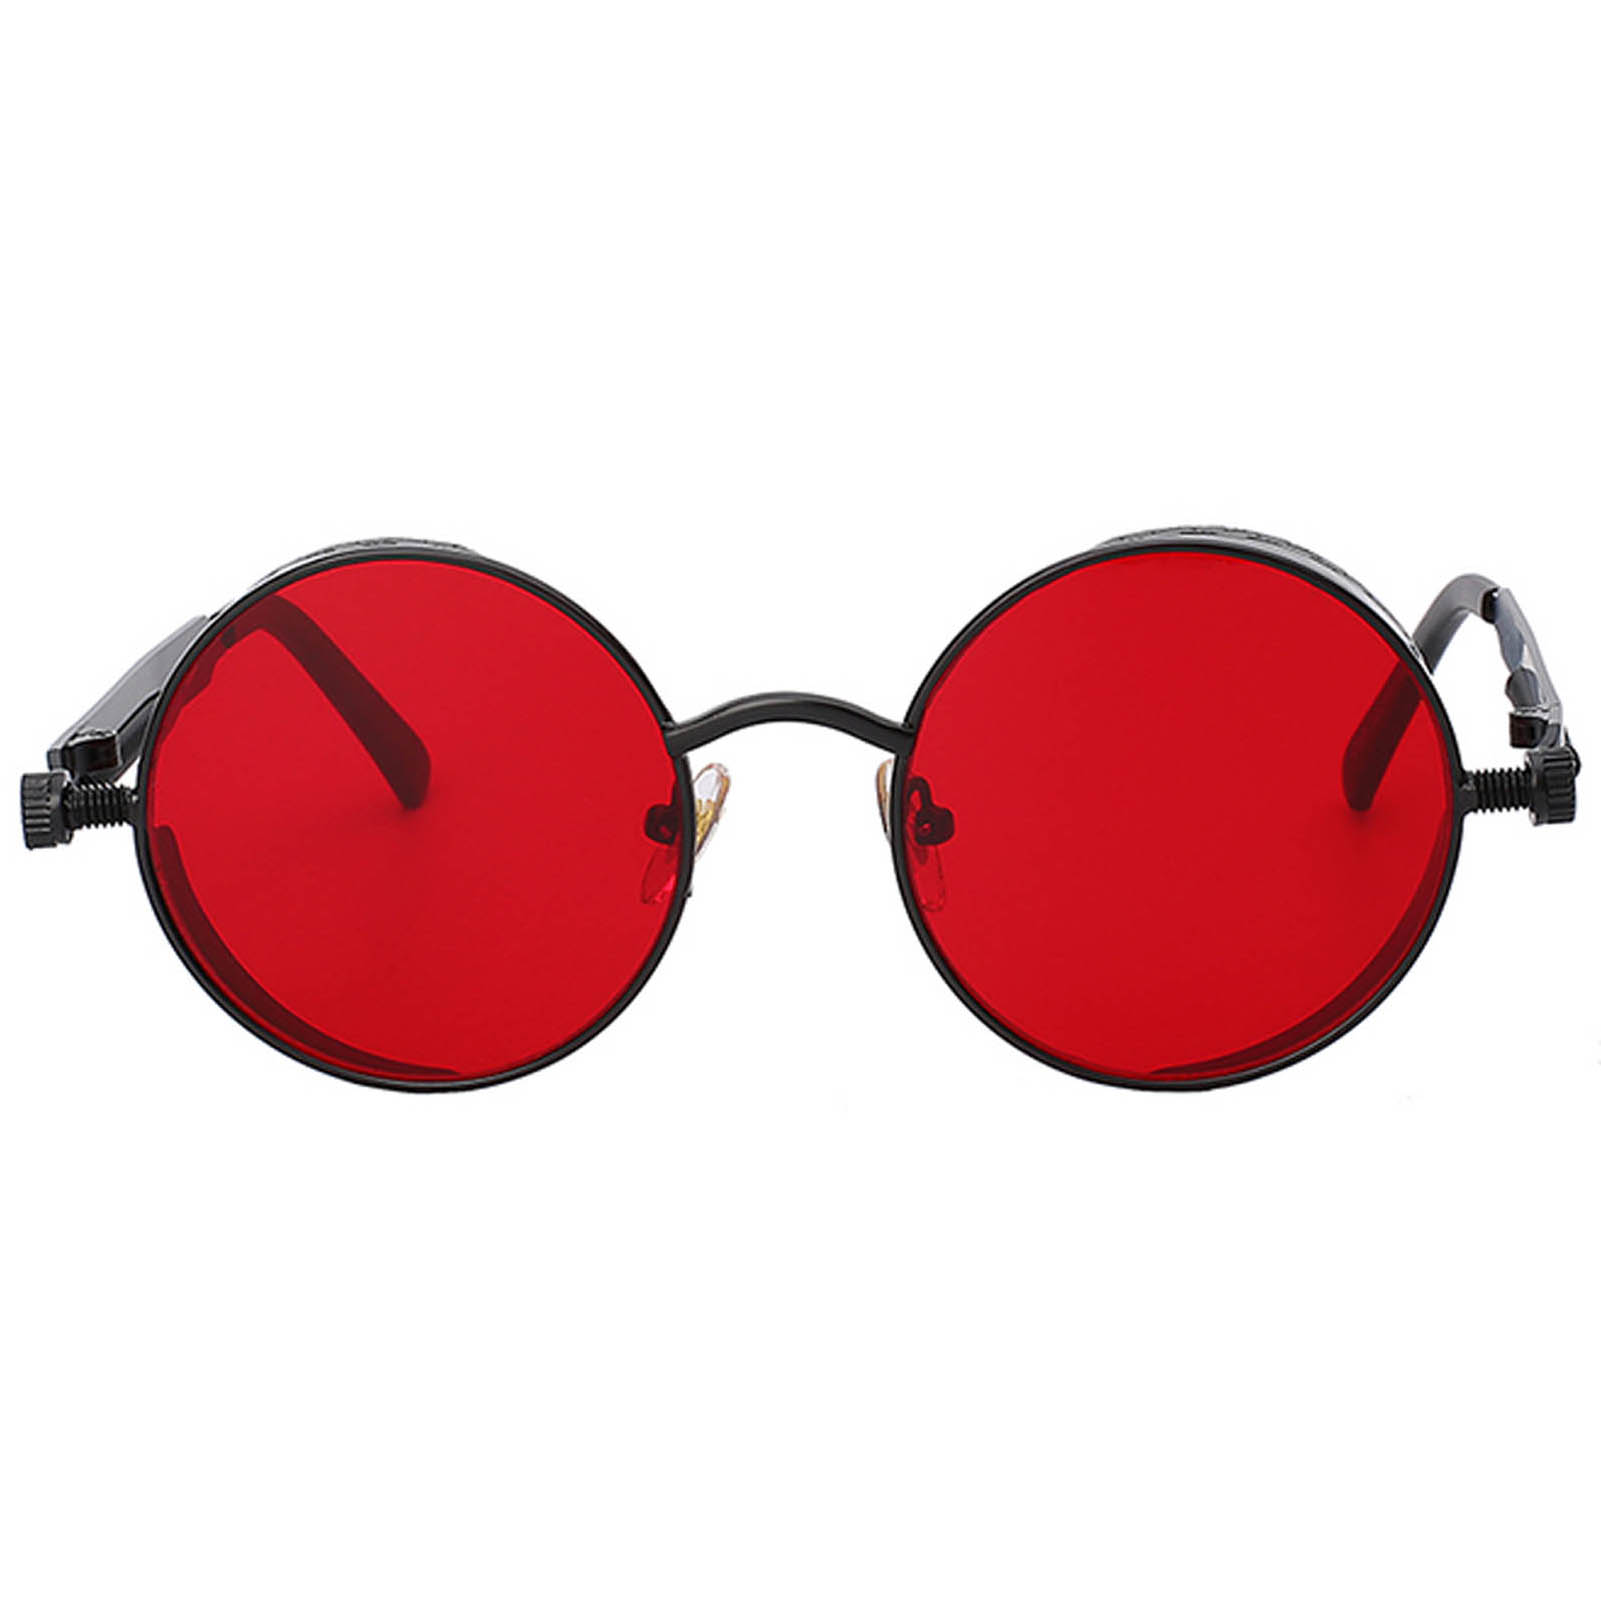 060 C9 Steampunk Gothic Sunglasses Metal Round Circle Black Frame ...